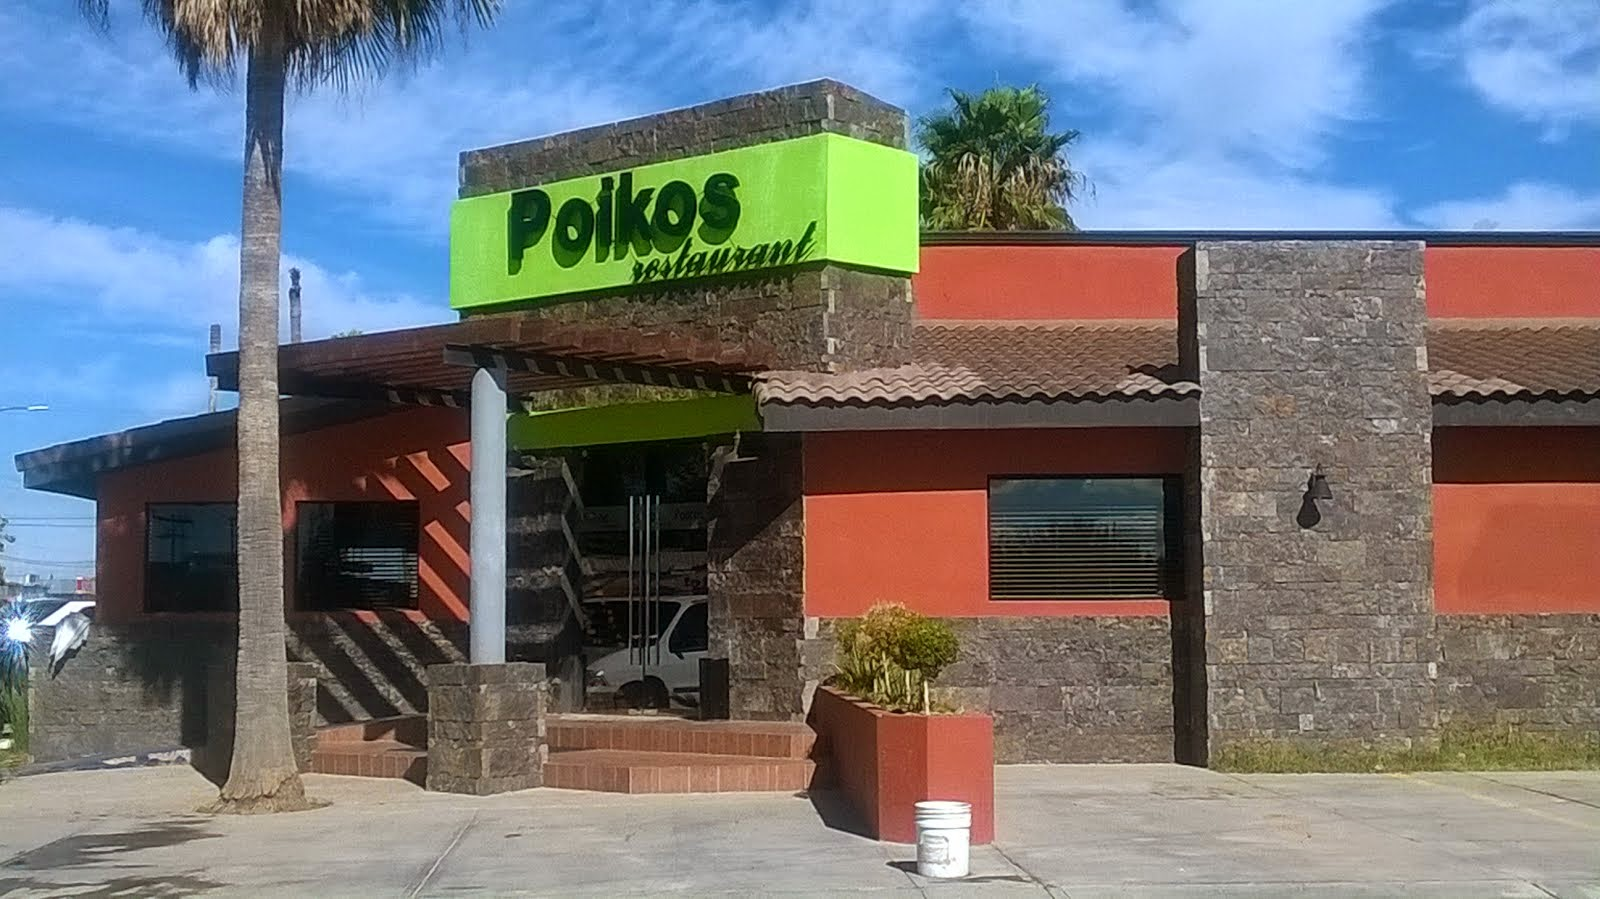 Poikos Restaurant